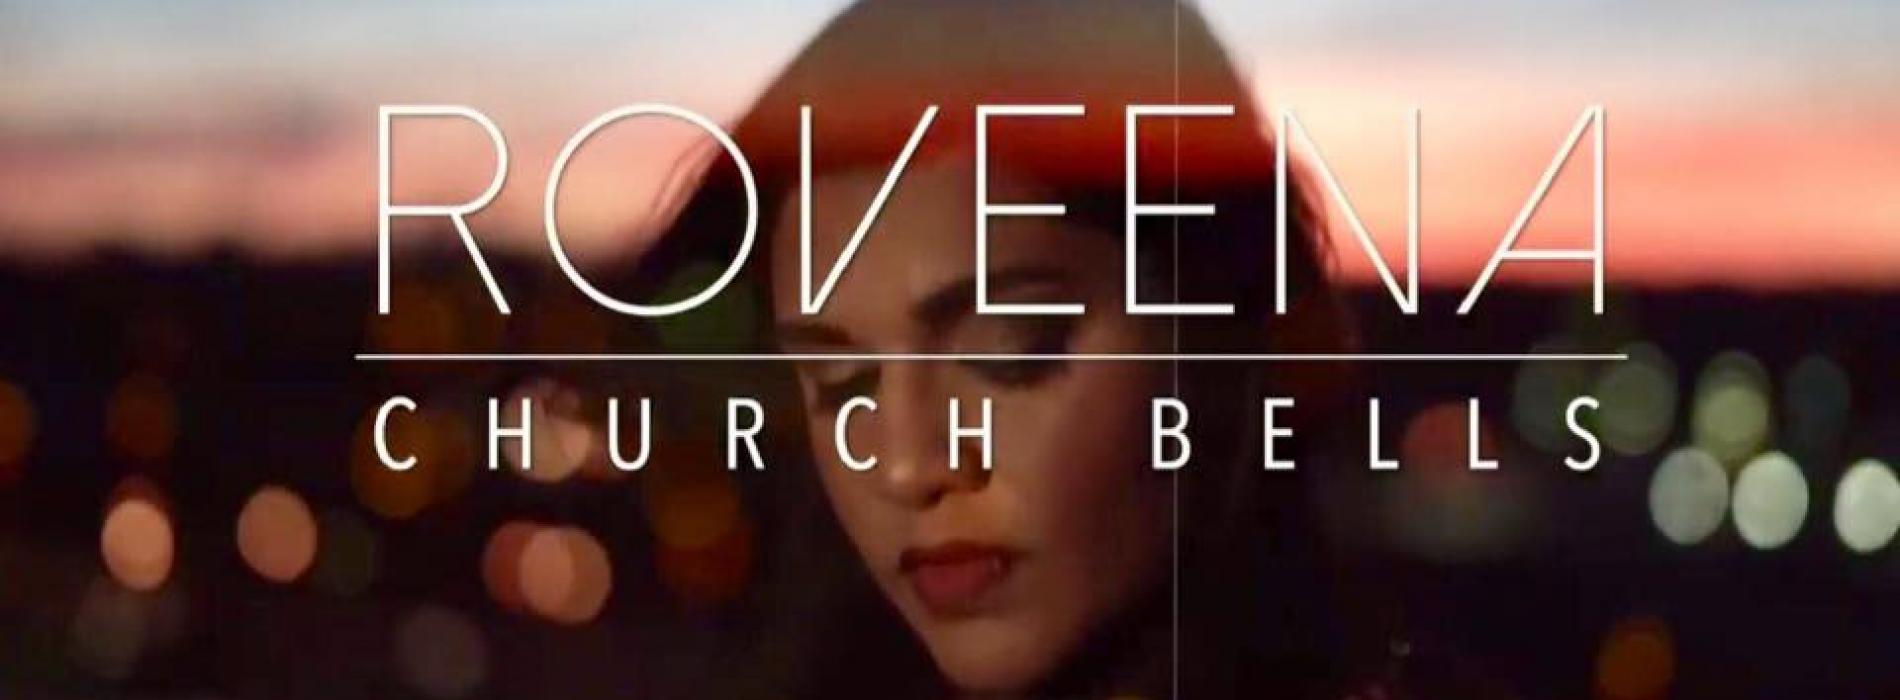 Carrie Underwood – Church Bells (Roveena Cover)